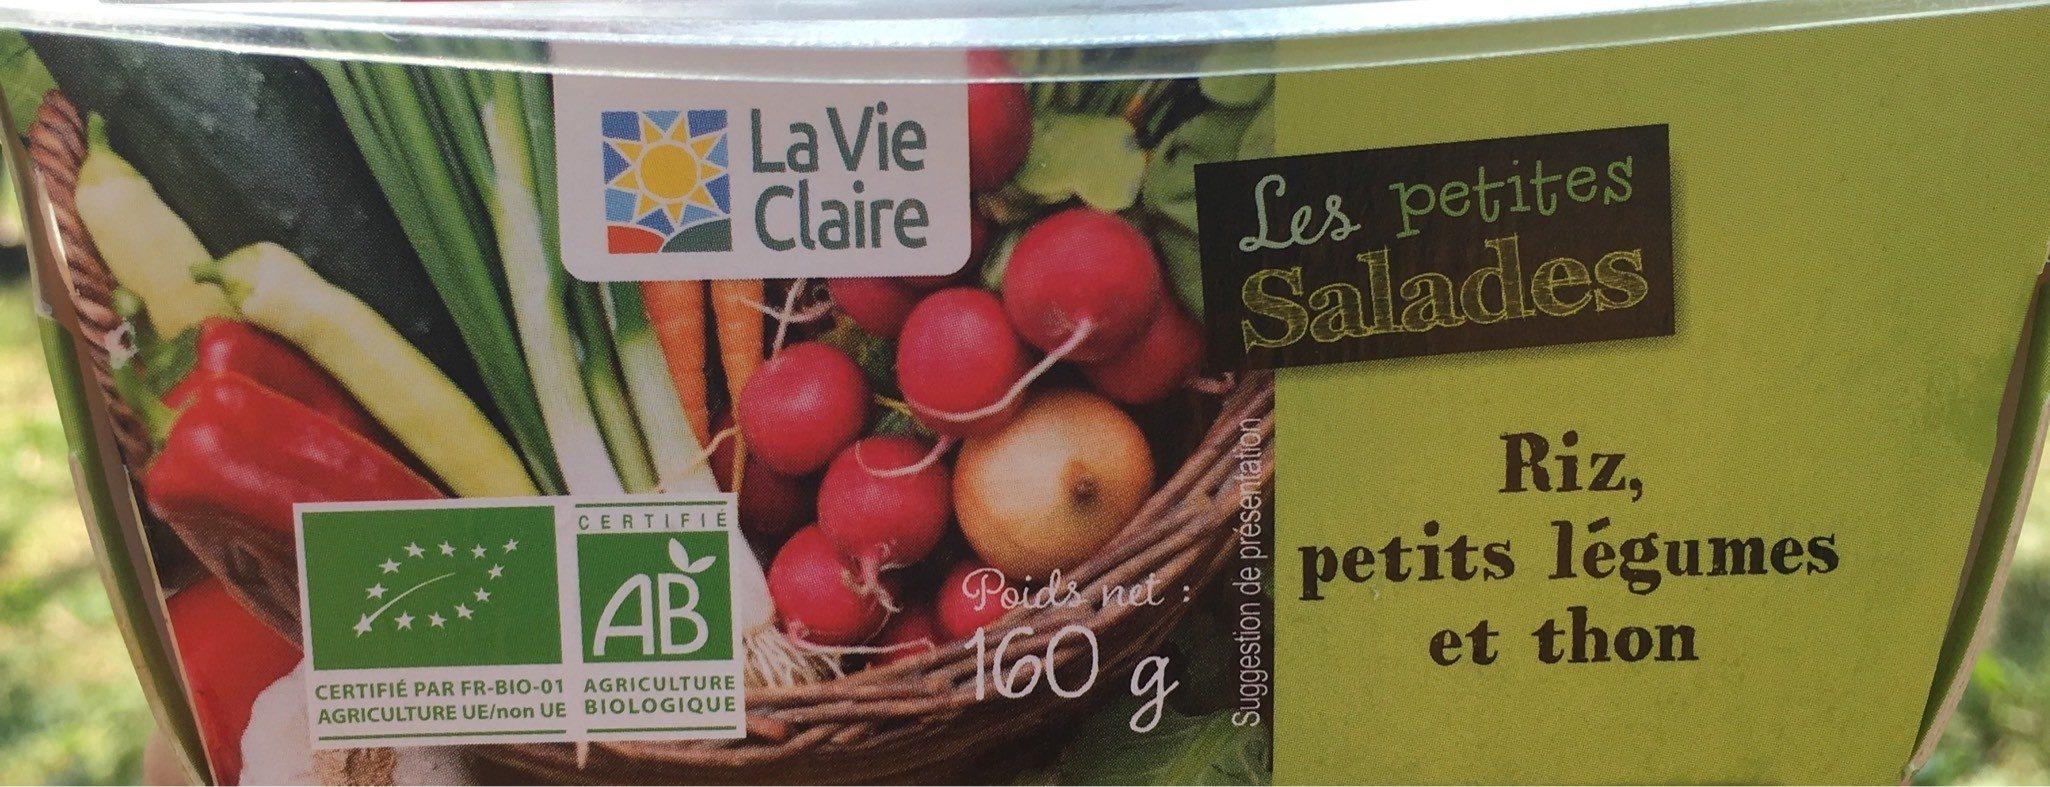 Salade riz - Product